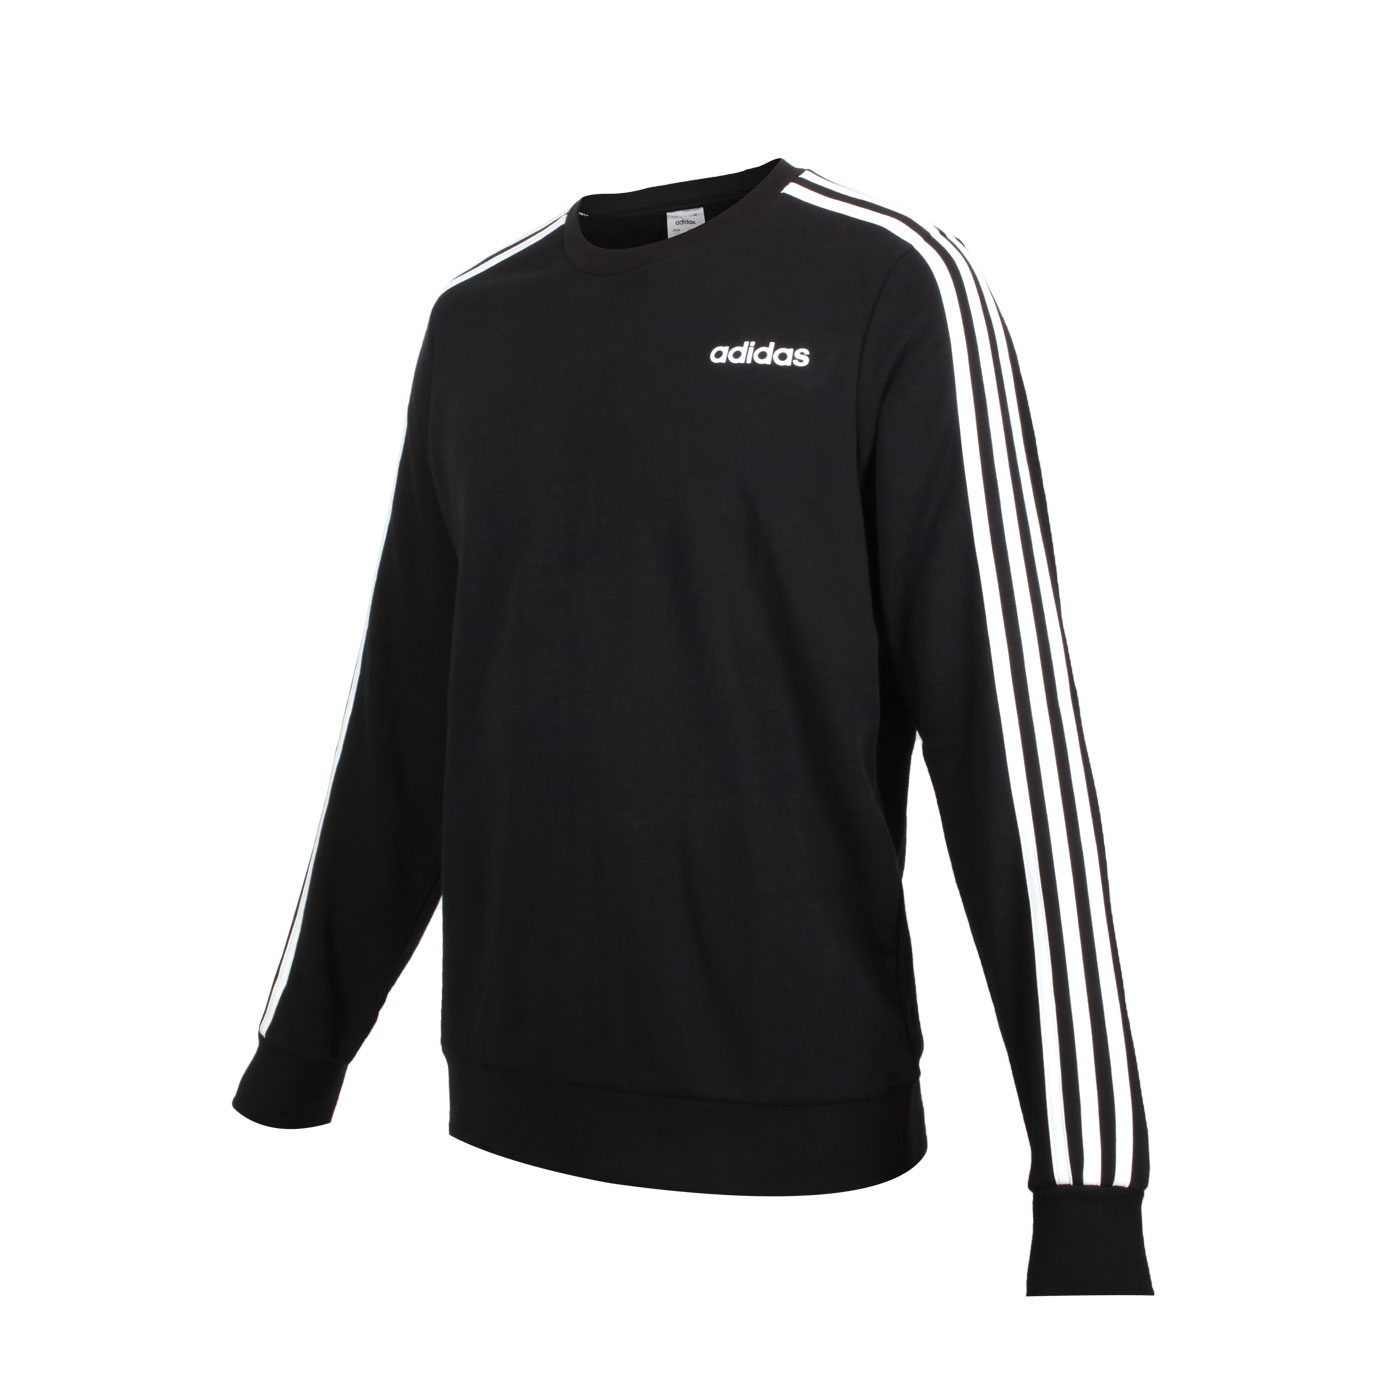 ADIDAS 男款長袖T恤 DQ3083 - 黑白